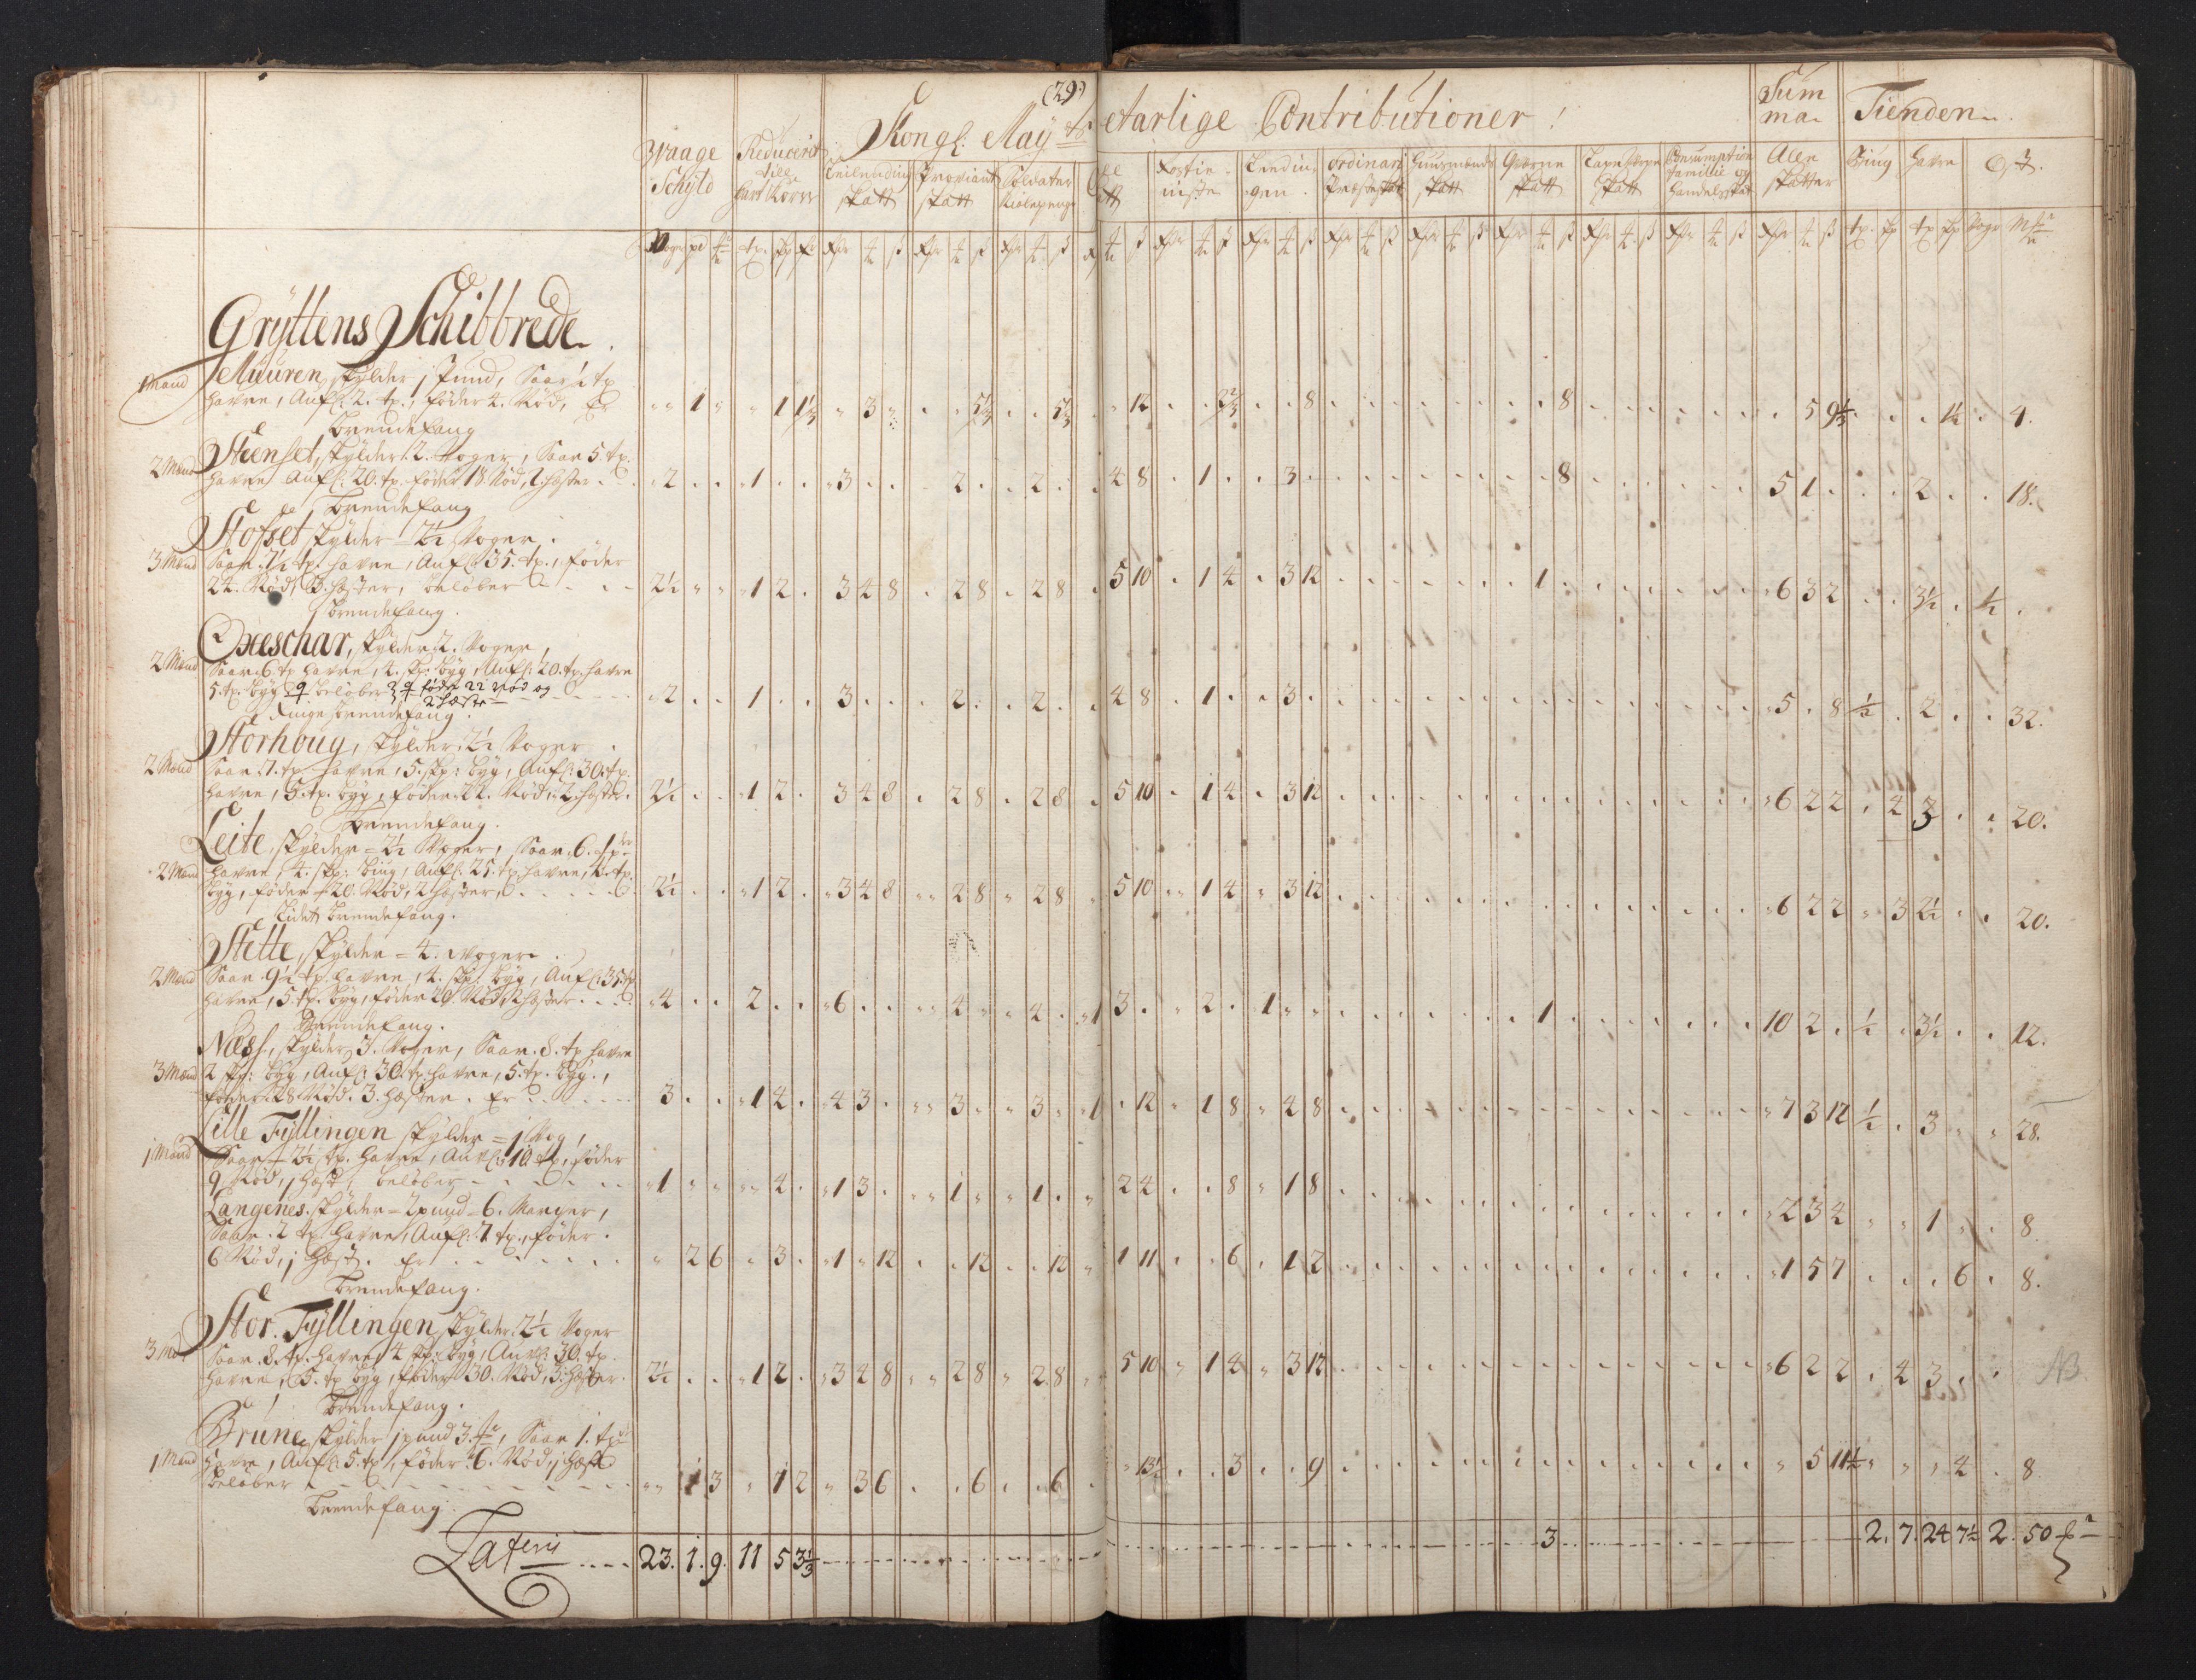 RA, Rentekammeret inntil 1814, Realistisk ordnet avdeling, N/Nb/Nbf/L0149: Sunnmøre, prøvematrikkel, 1714, s. 28b-29a